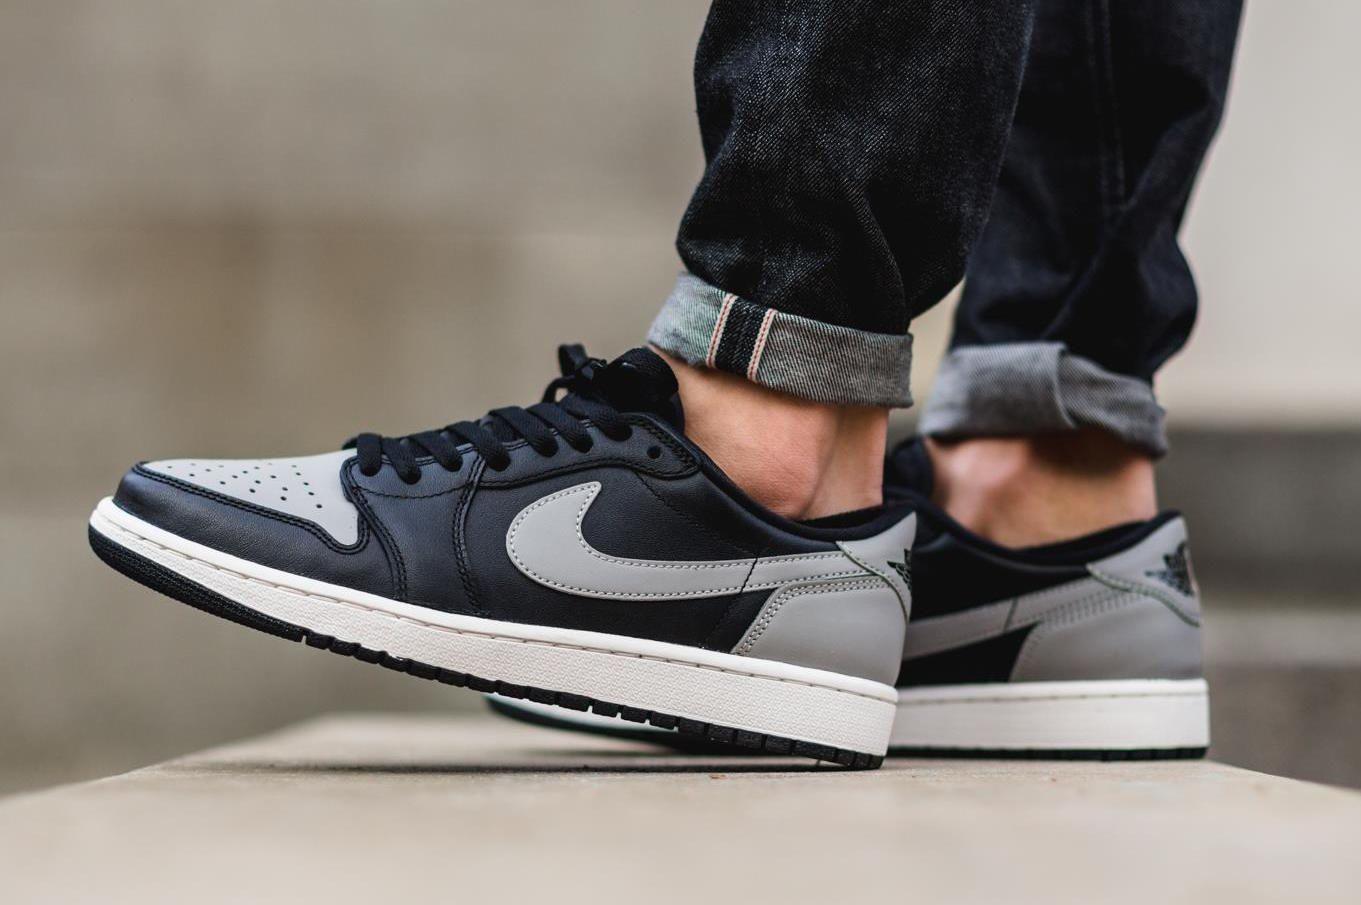 Nike Air Jordan 1 Retro OG 'Shadow'